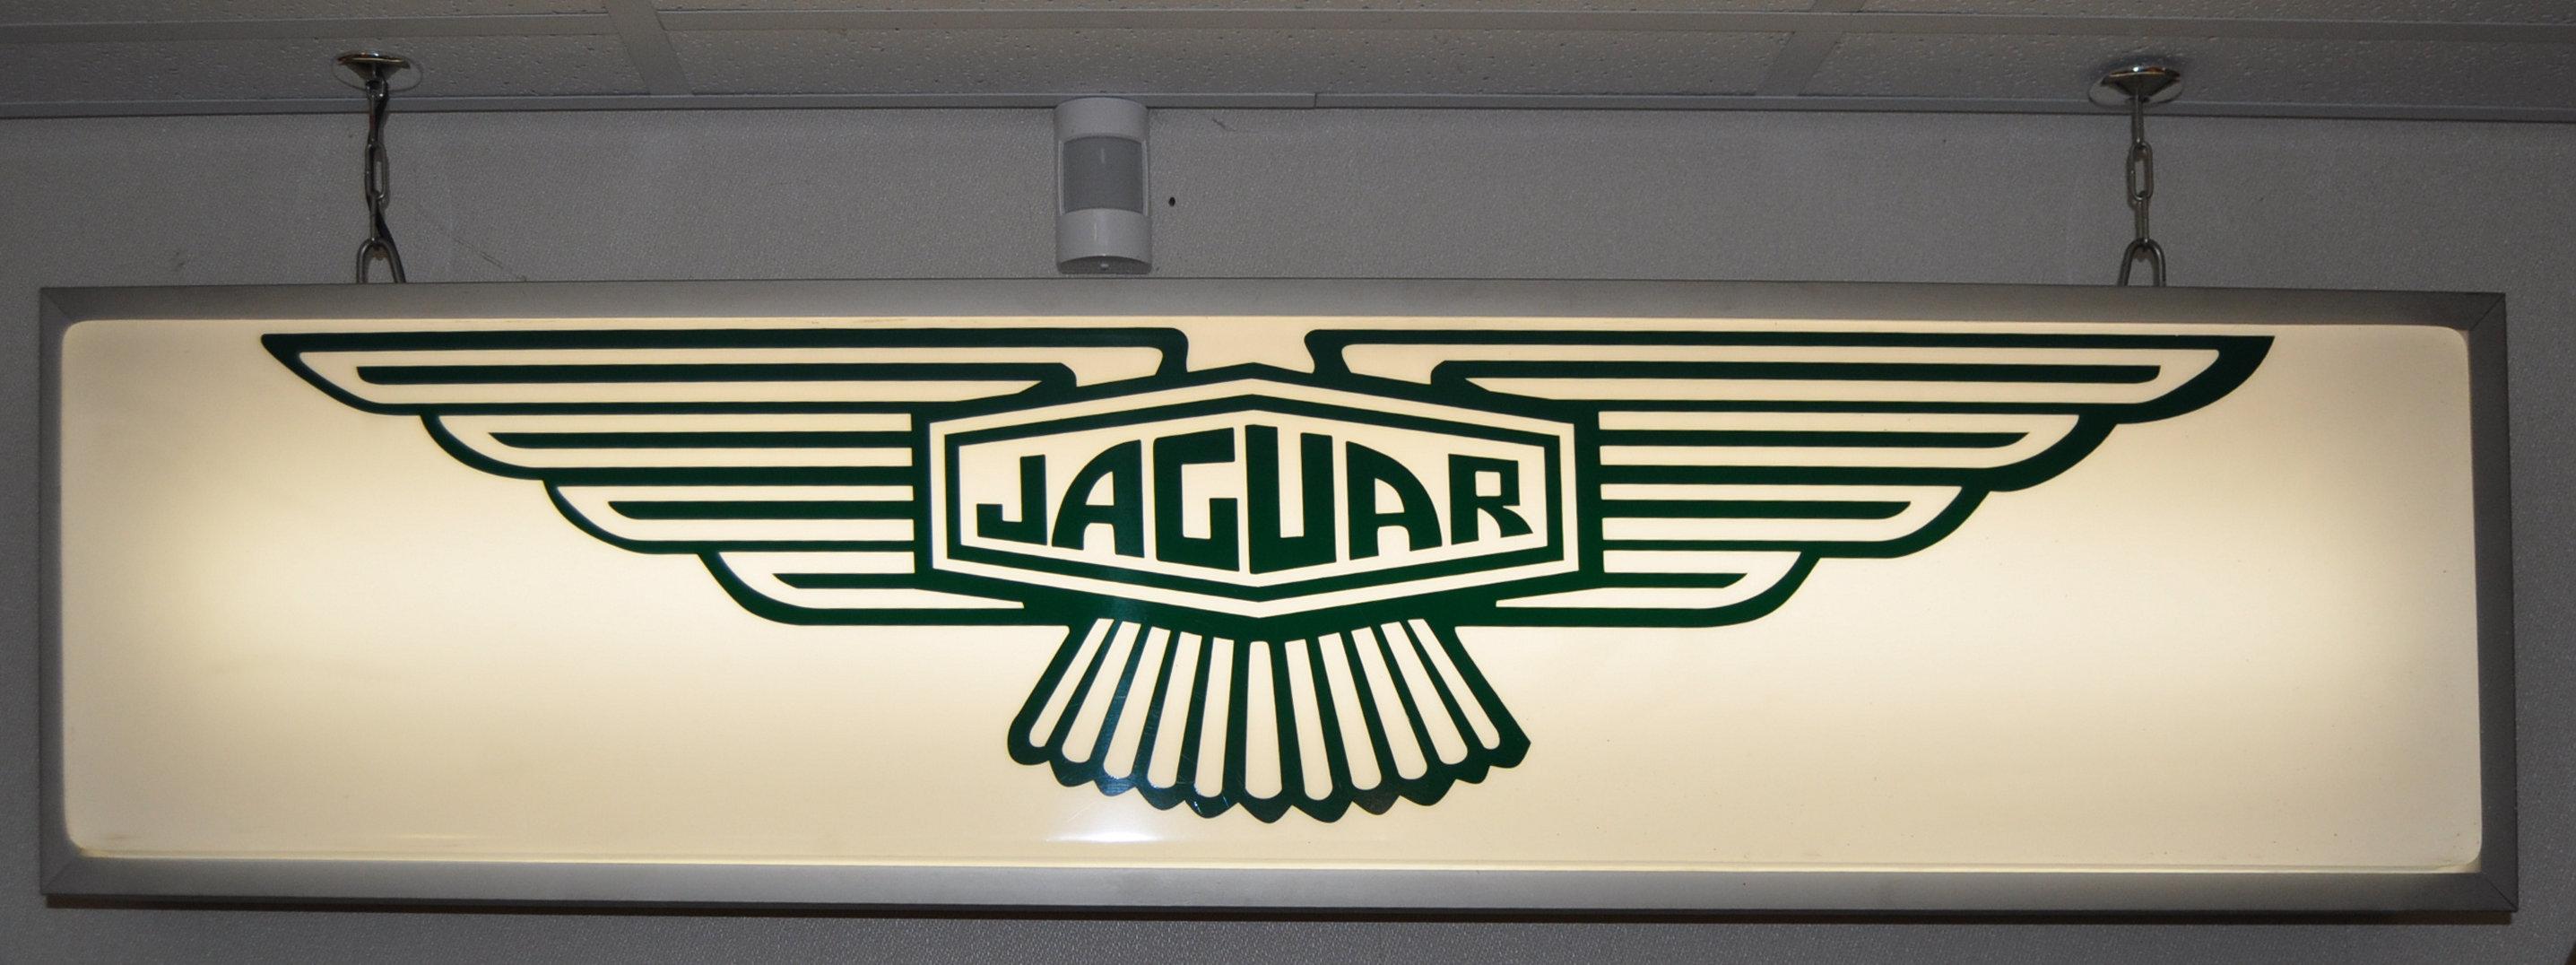 JAGUAR - ORIGINAL DEALERSHIP LIGHTBOX ADVERTISING SIGN